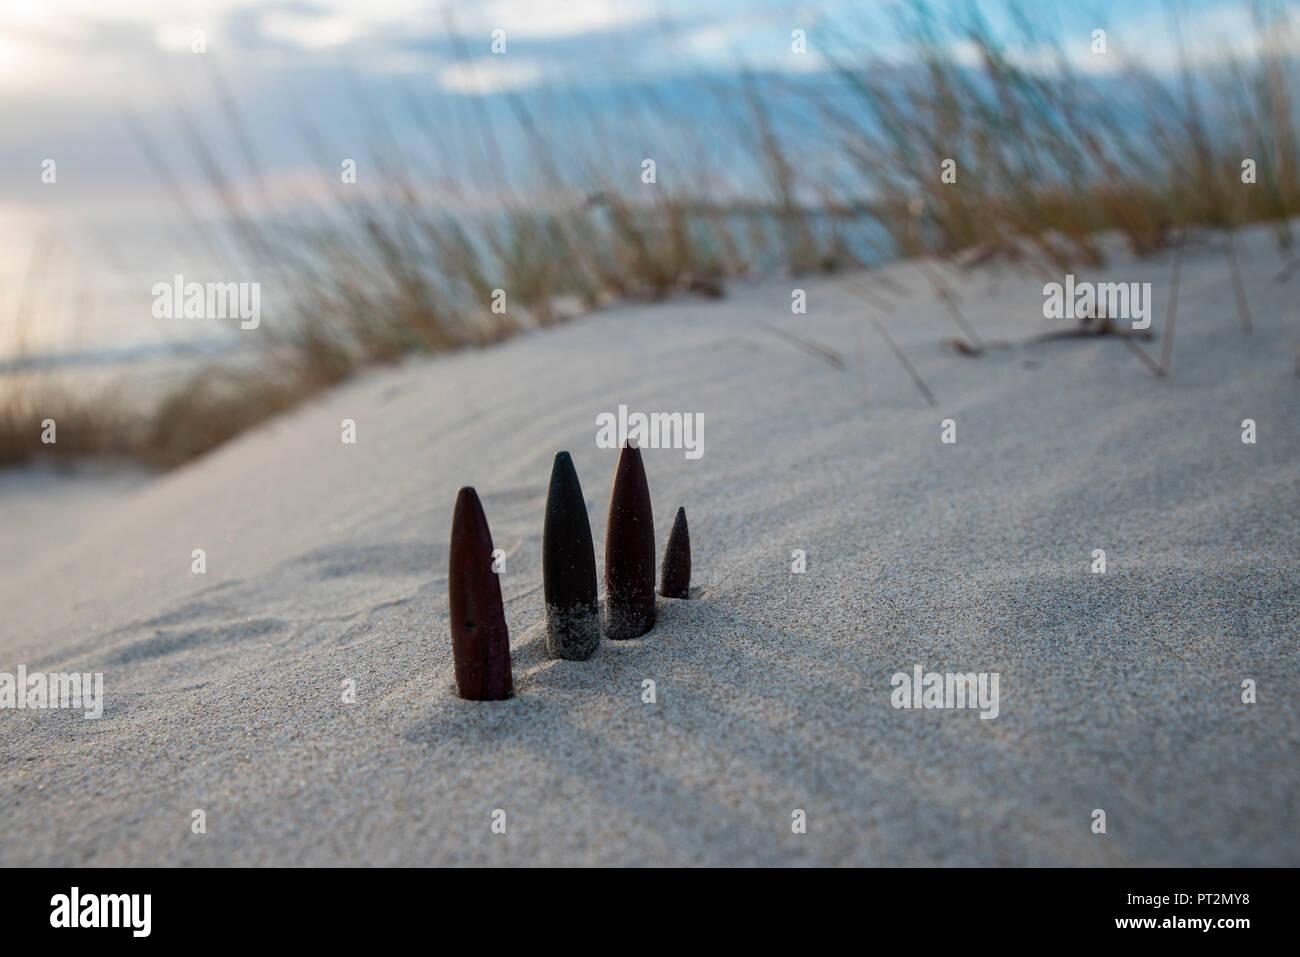 bullets in the military base, Teulada, Cagliari Province, Sardinia, Italy, Europe, - Stock Image